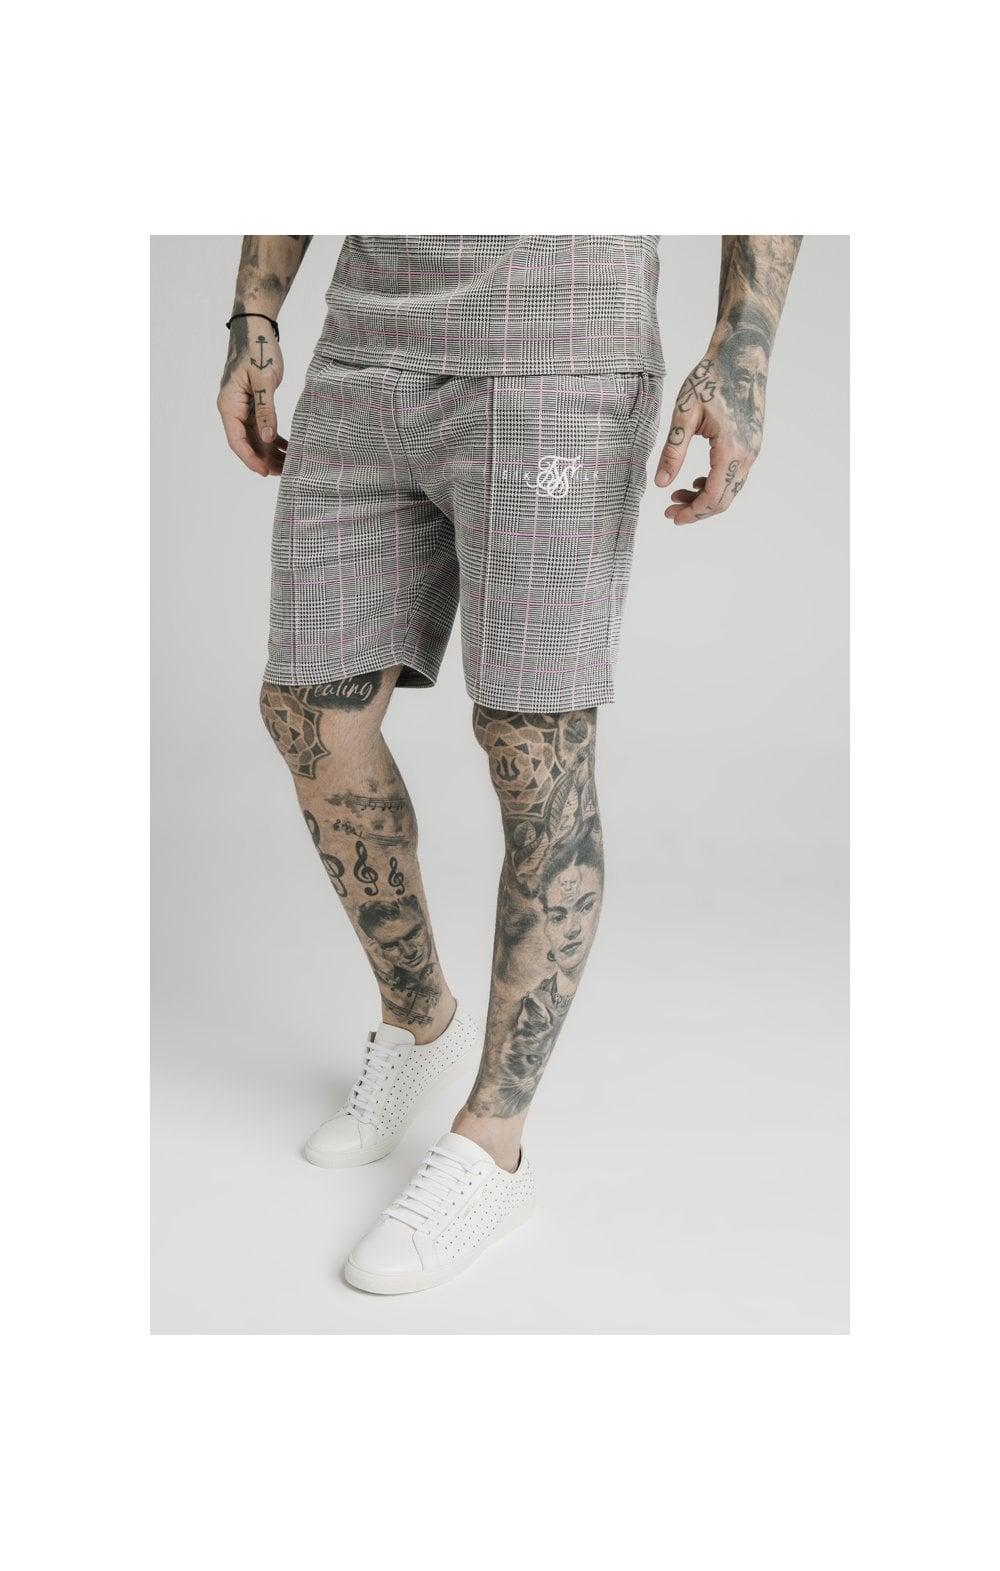 SikSilk Pleated Smart Shorts  Grey & Pink Check MEN SIZES BOTTOM: